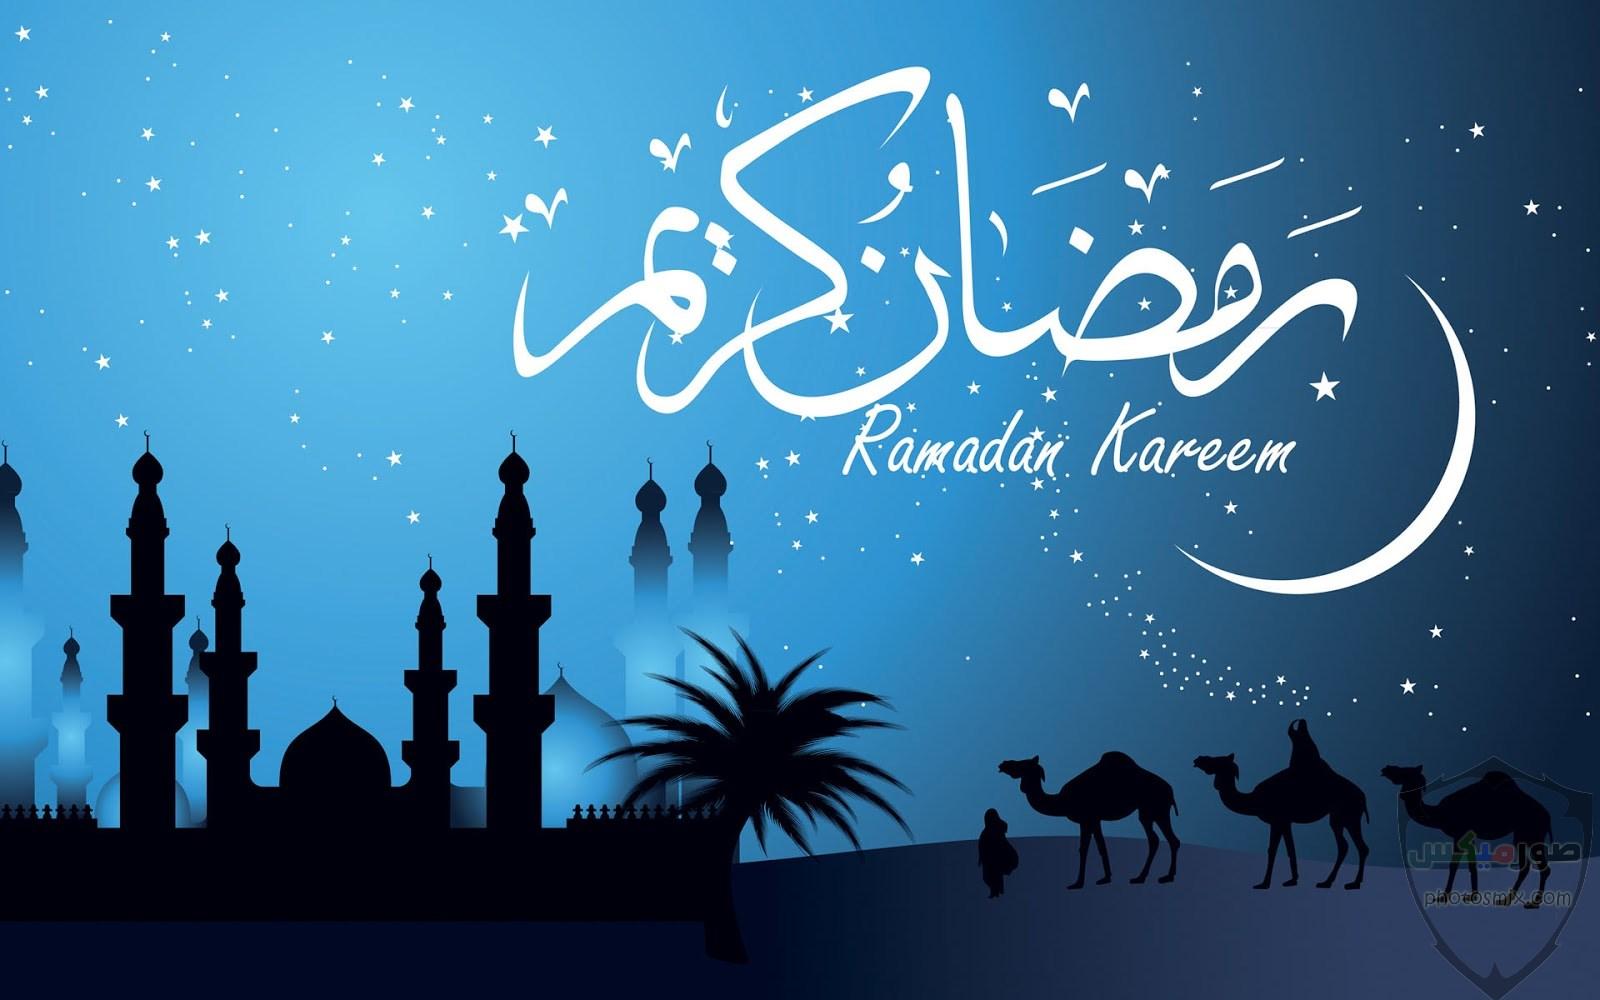 صور تهنئة بمناسبة رمضان 2020 16